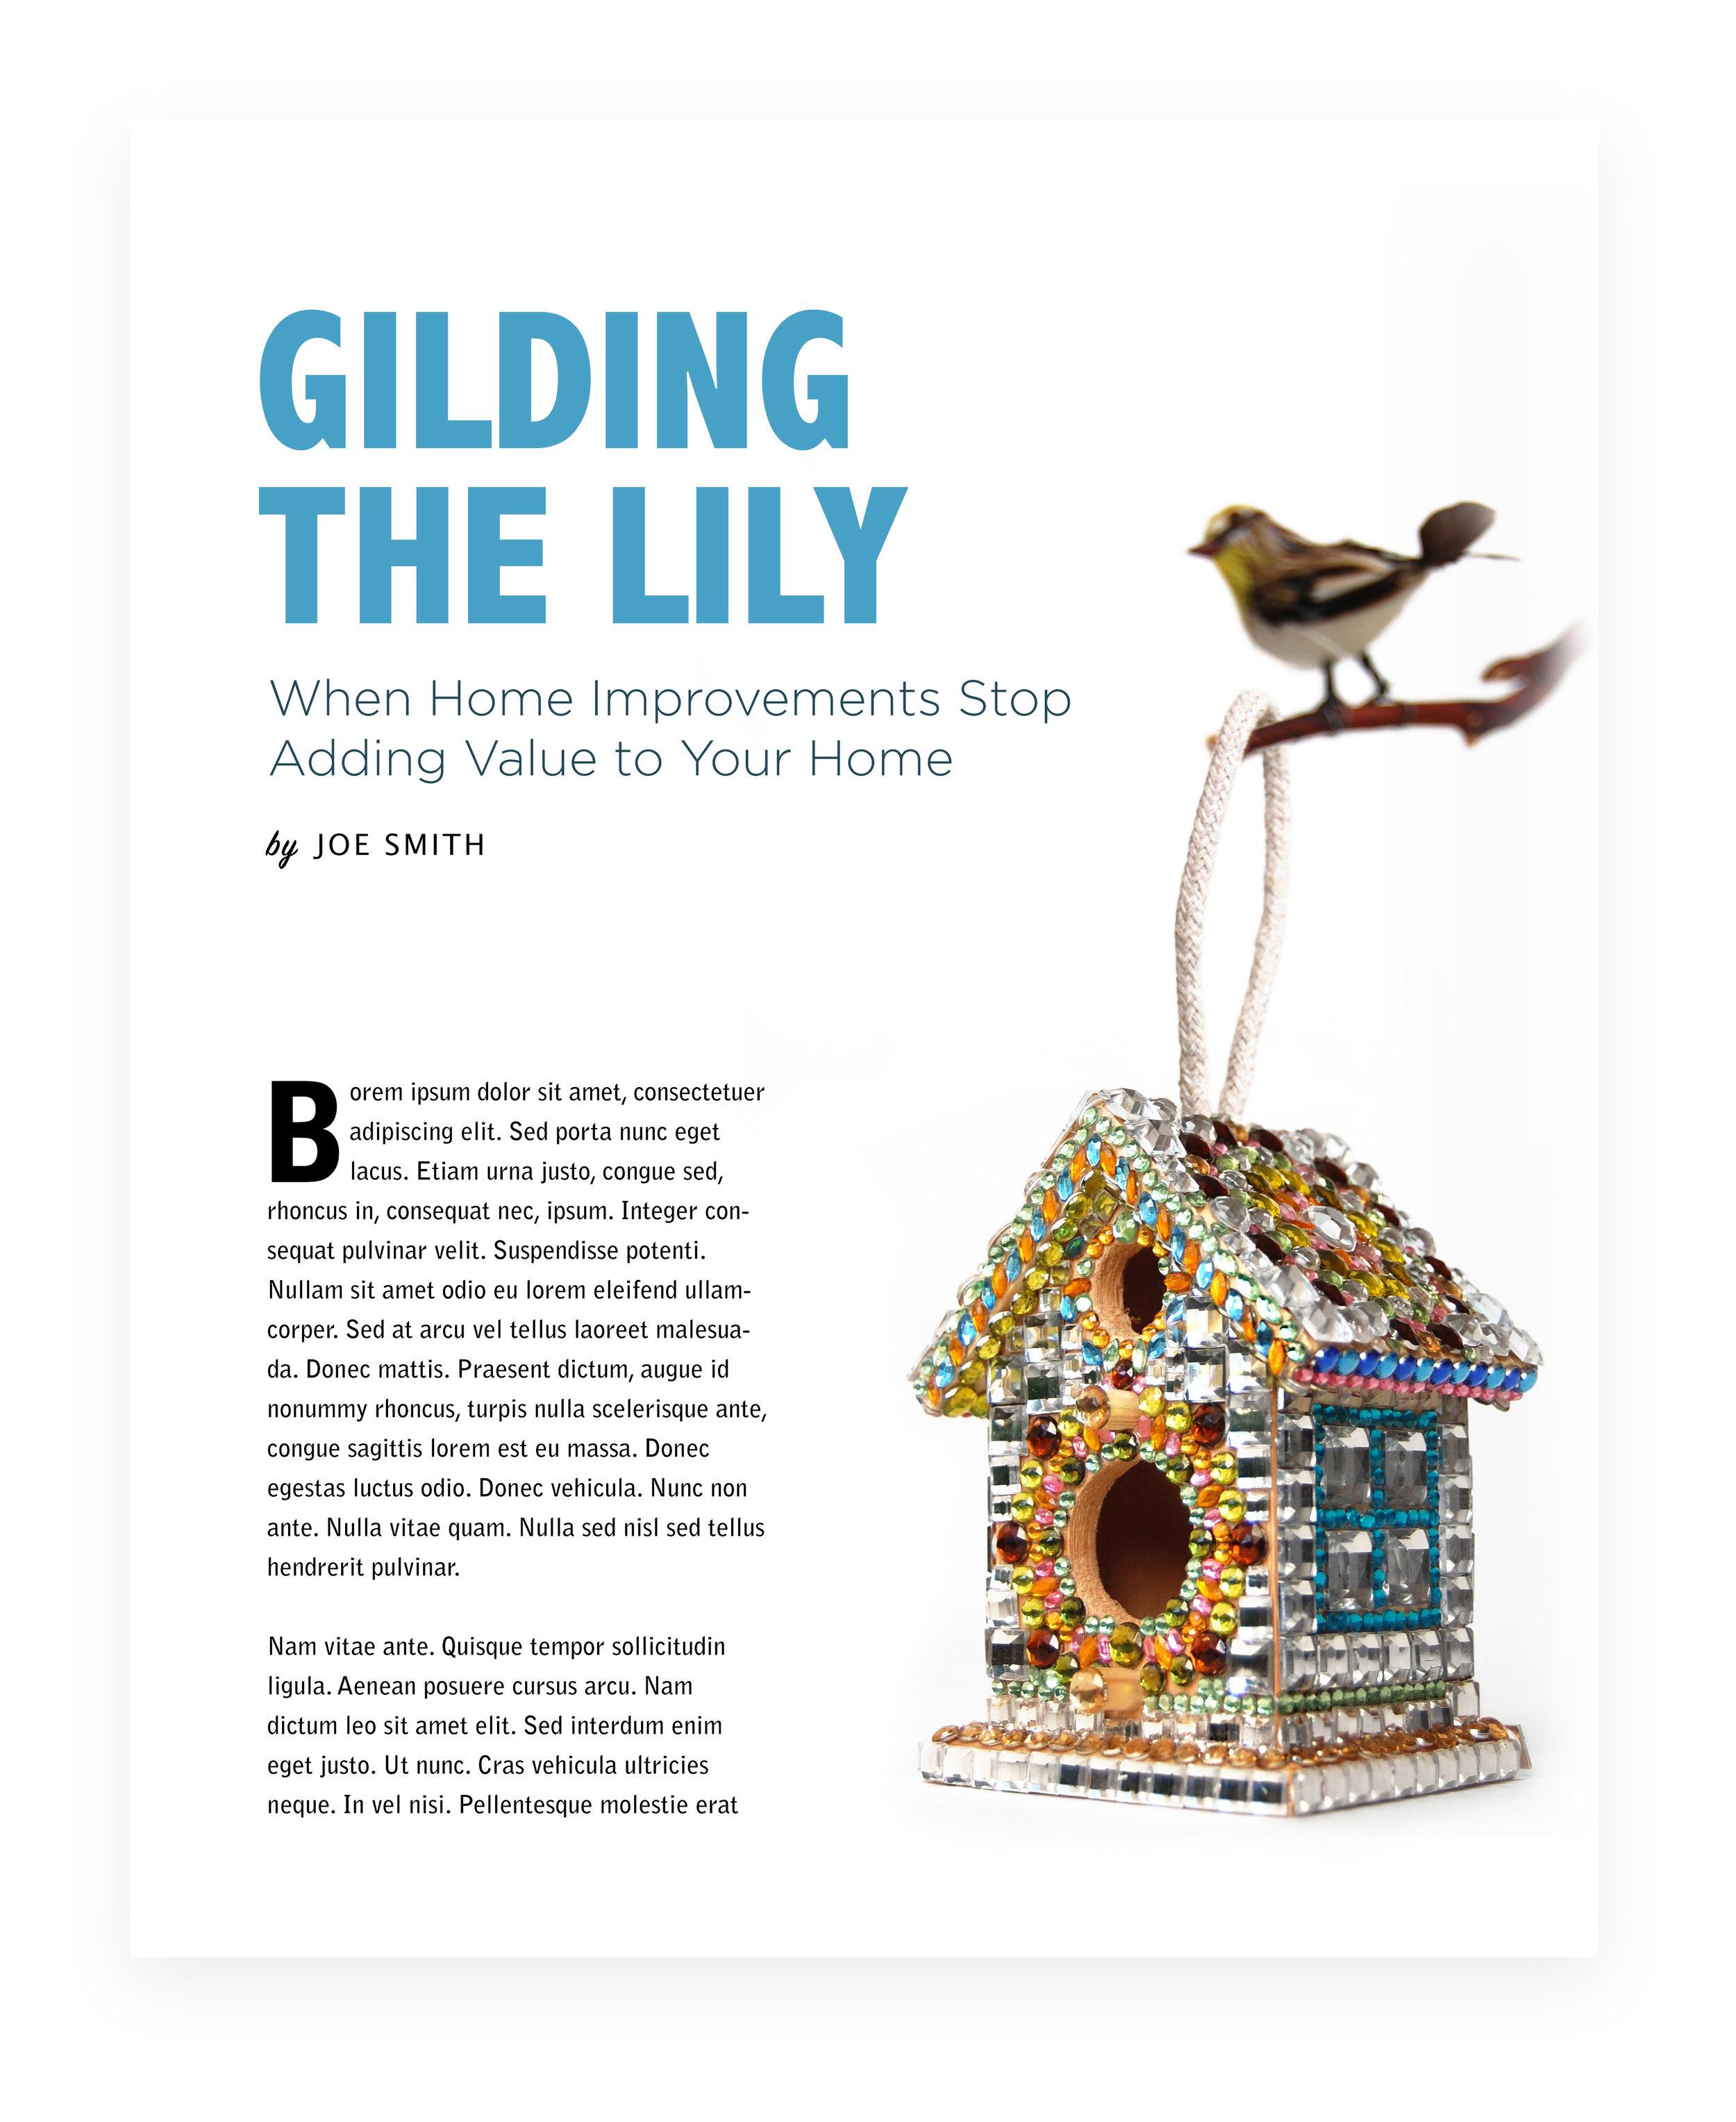 "Home Improvement - Wooden birdhouse ornament, rhinestones, foam tape, glue, manzanita branch, toy birdApprox.4 1/2"" x 3 1/4"" x 2 3/4"""